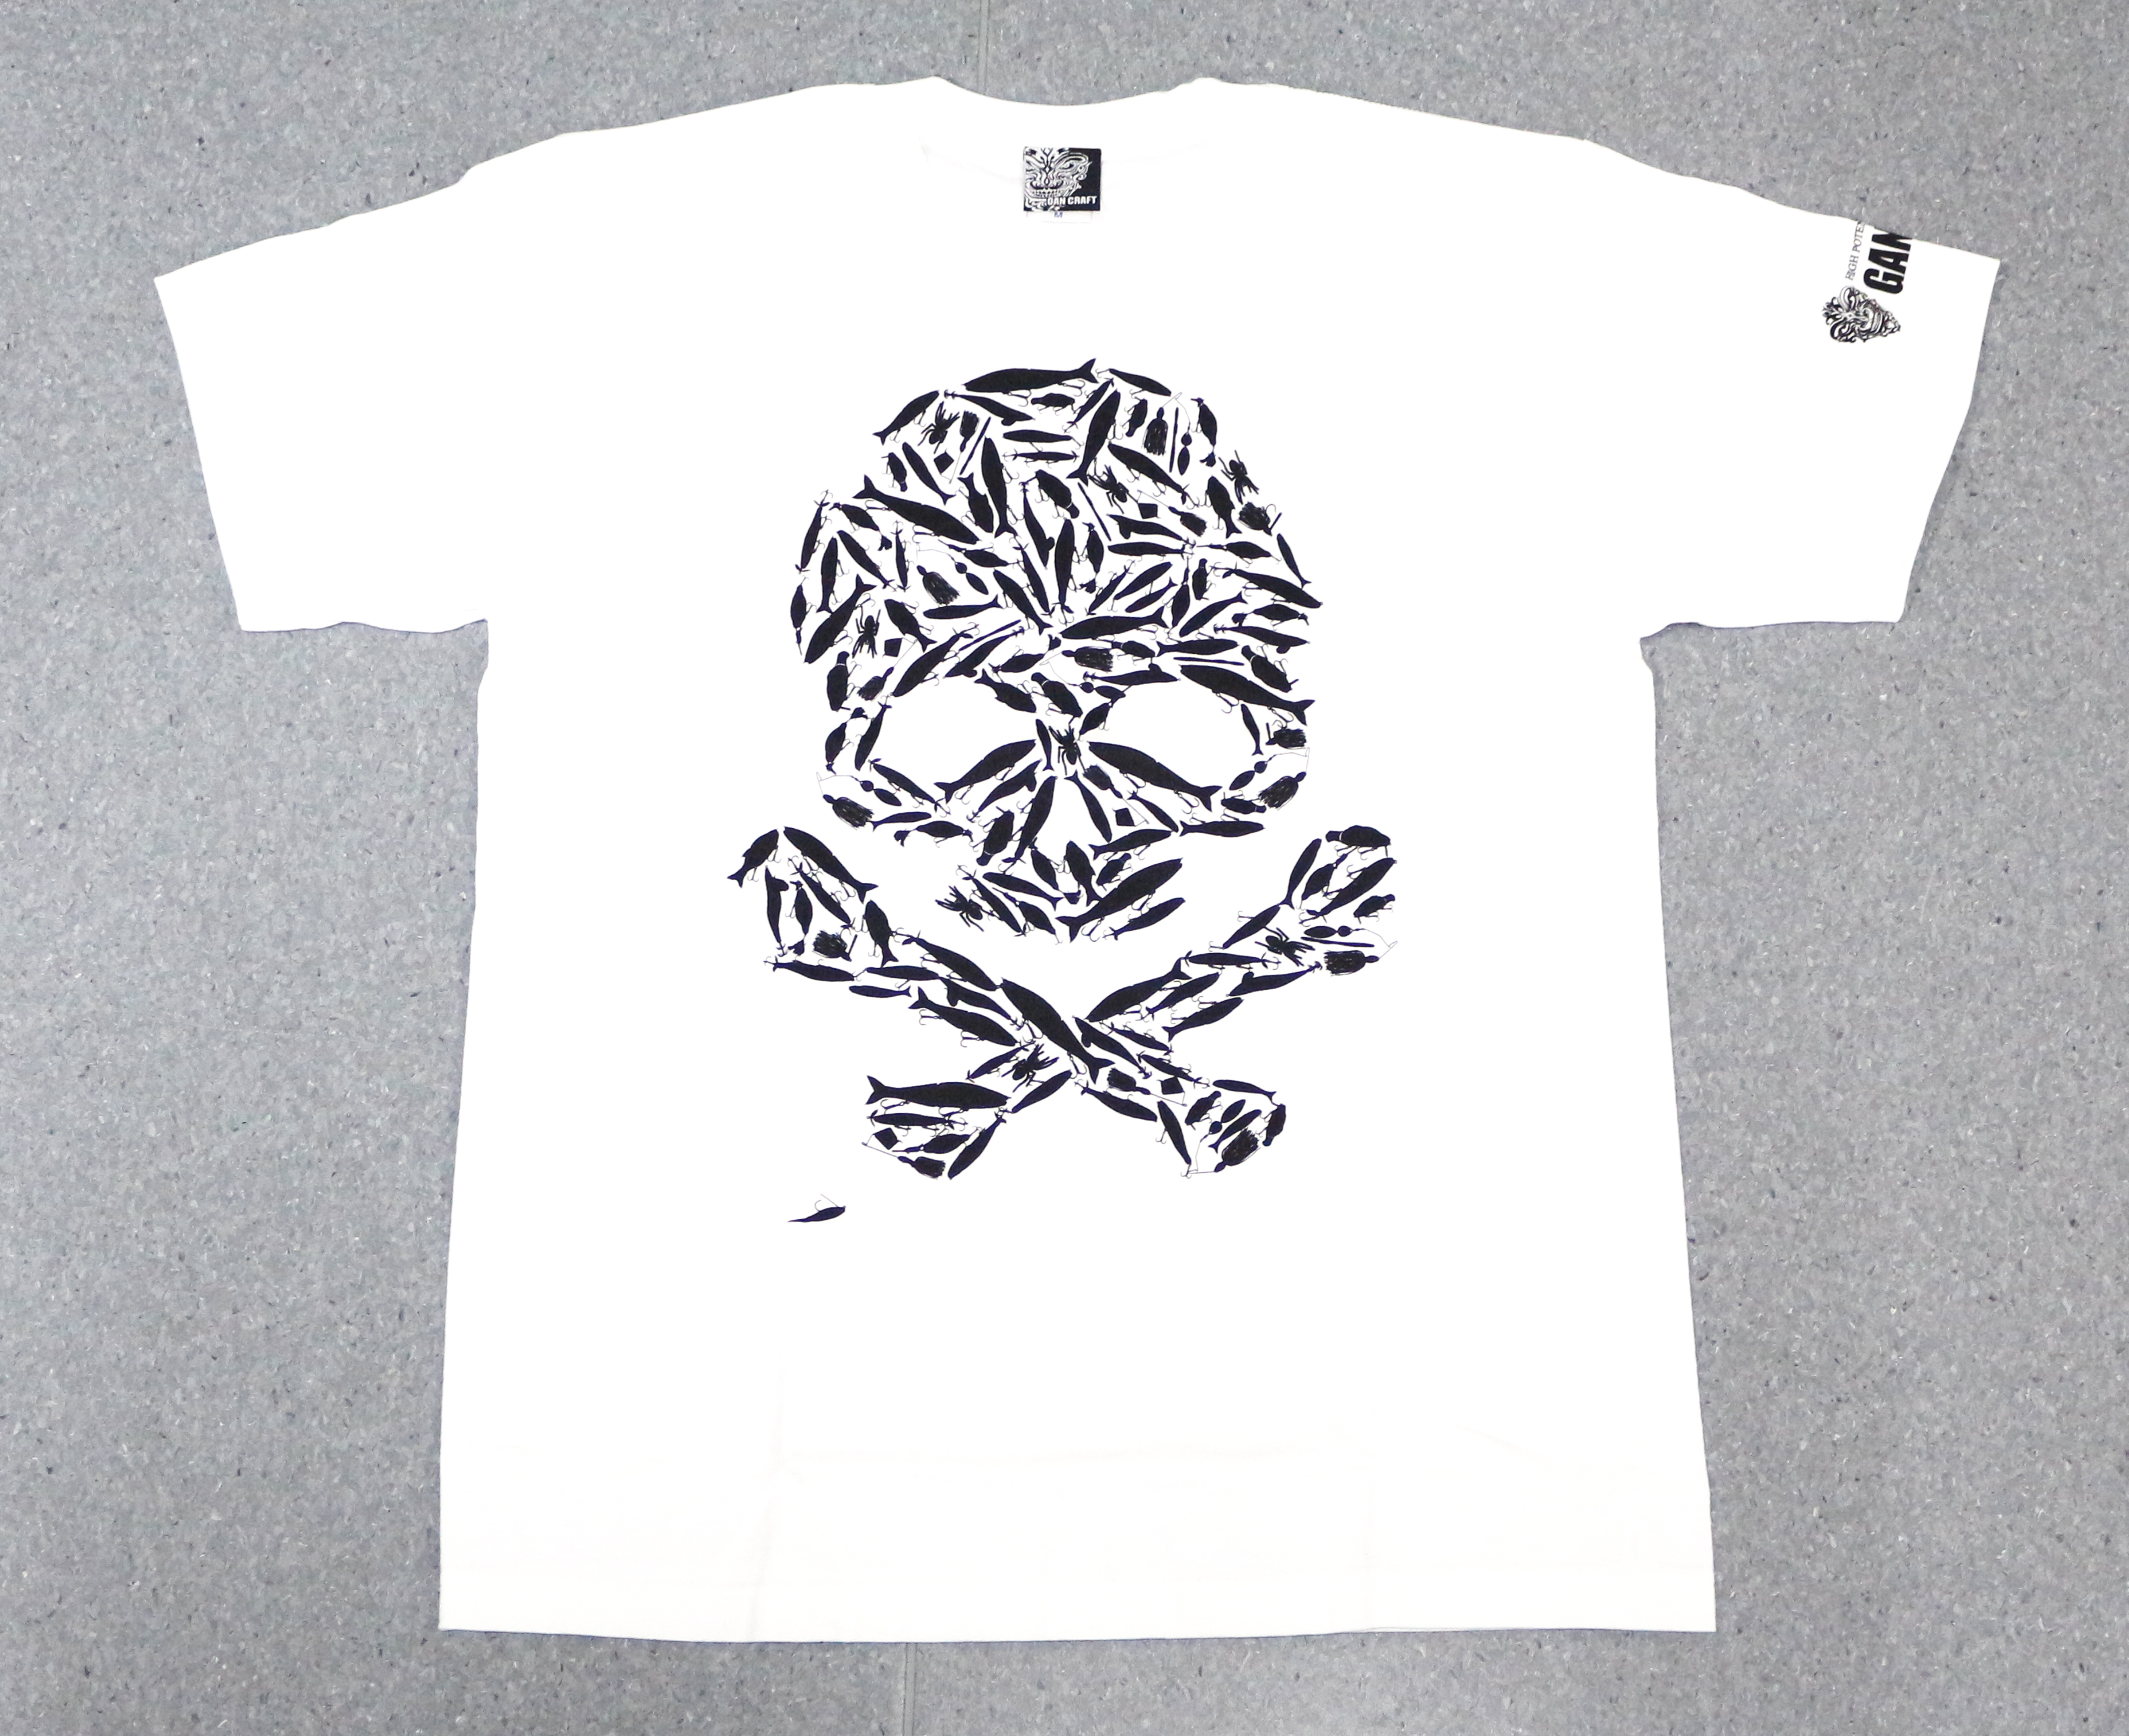 Gan Craft T Shirt Short Sleeve Lure Skull Tee Size M White (6936)